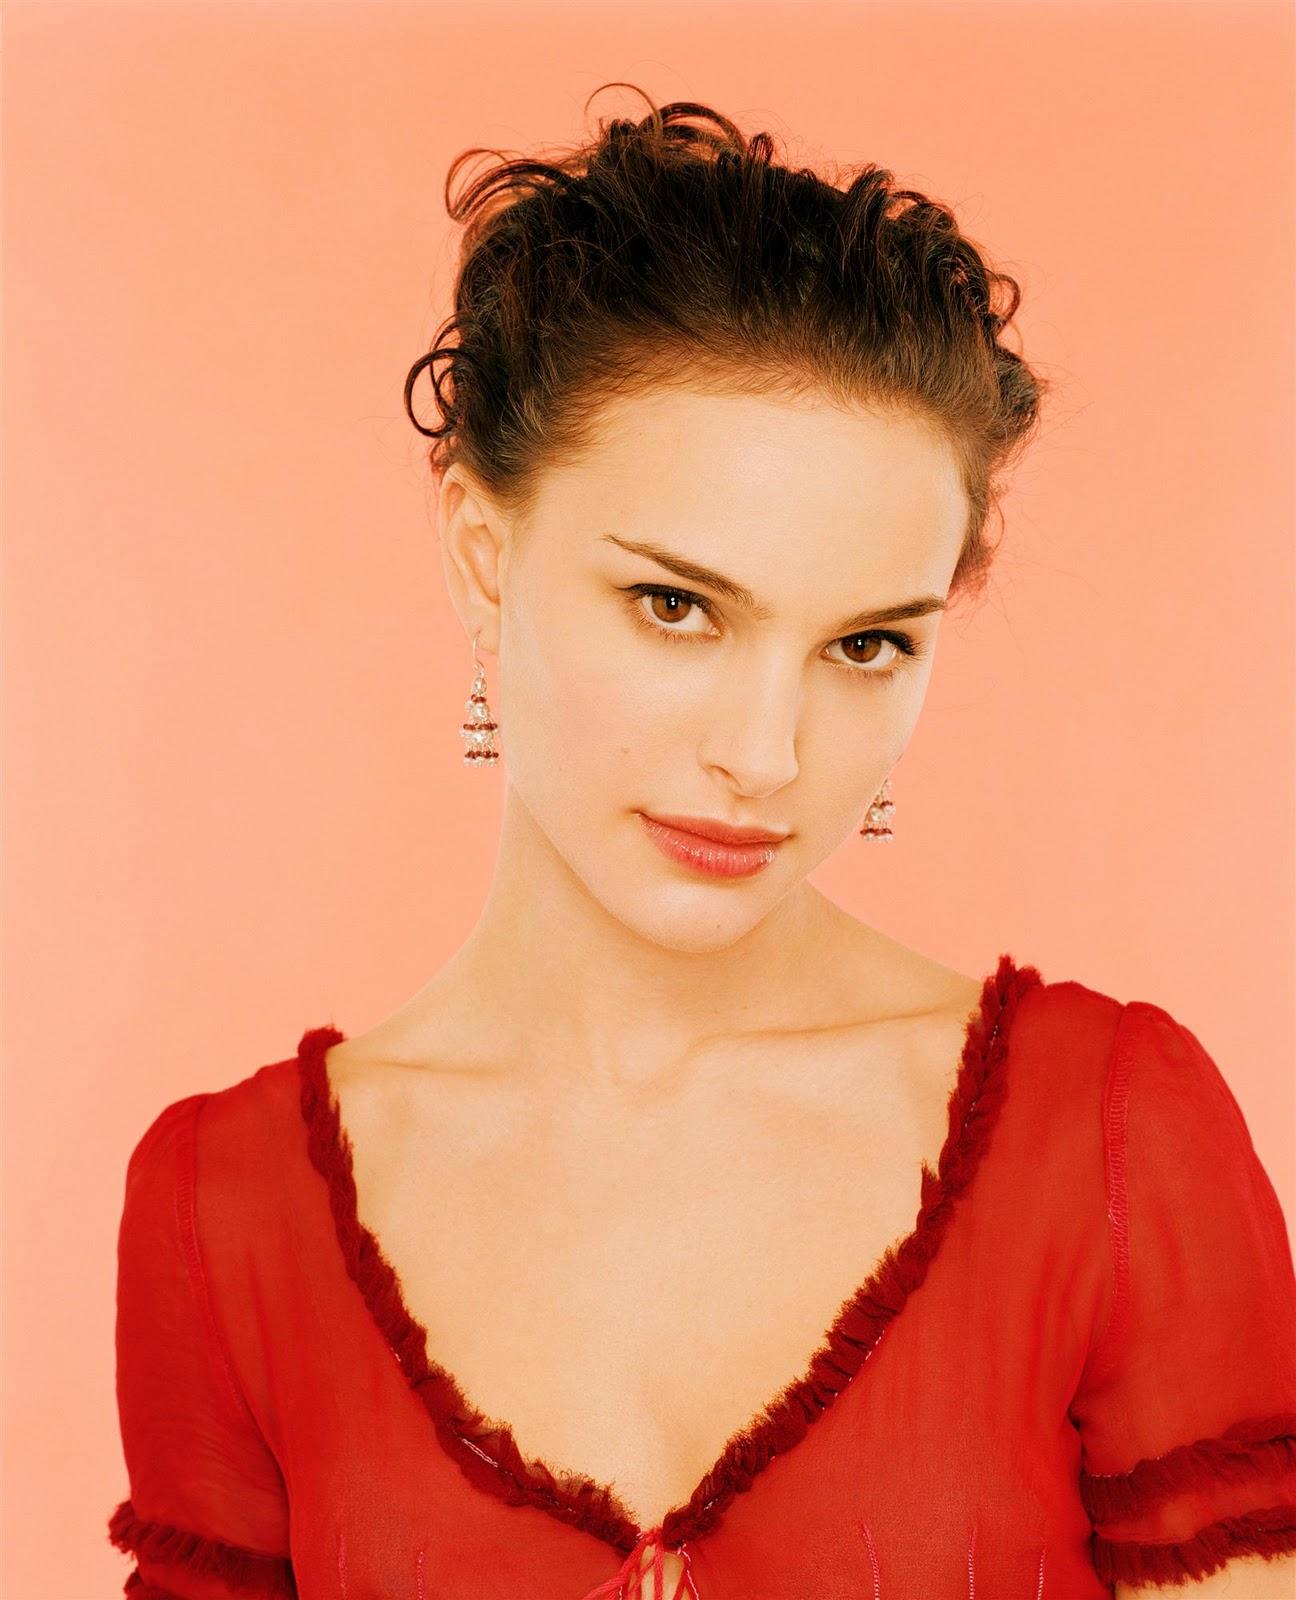 Natalie Hot Filme